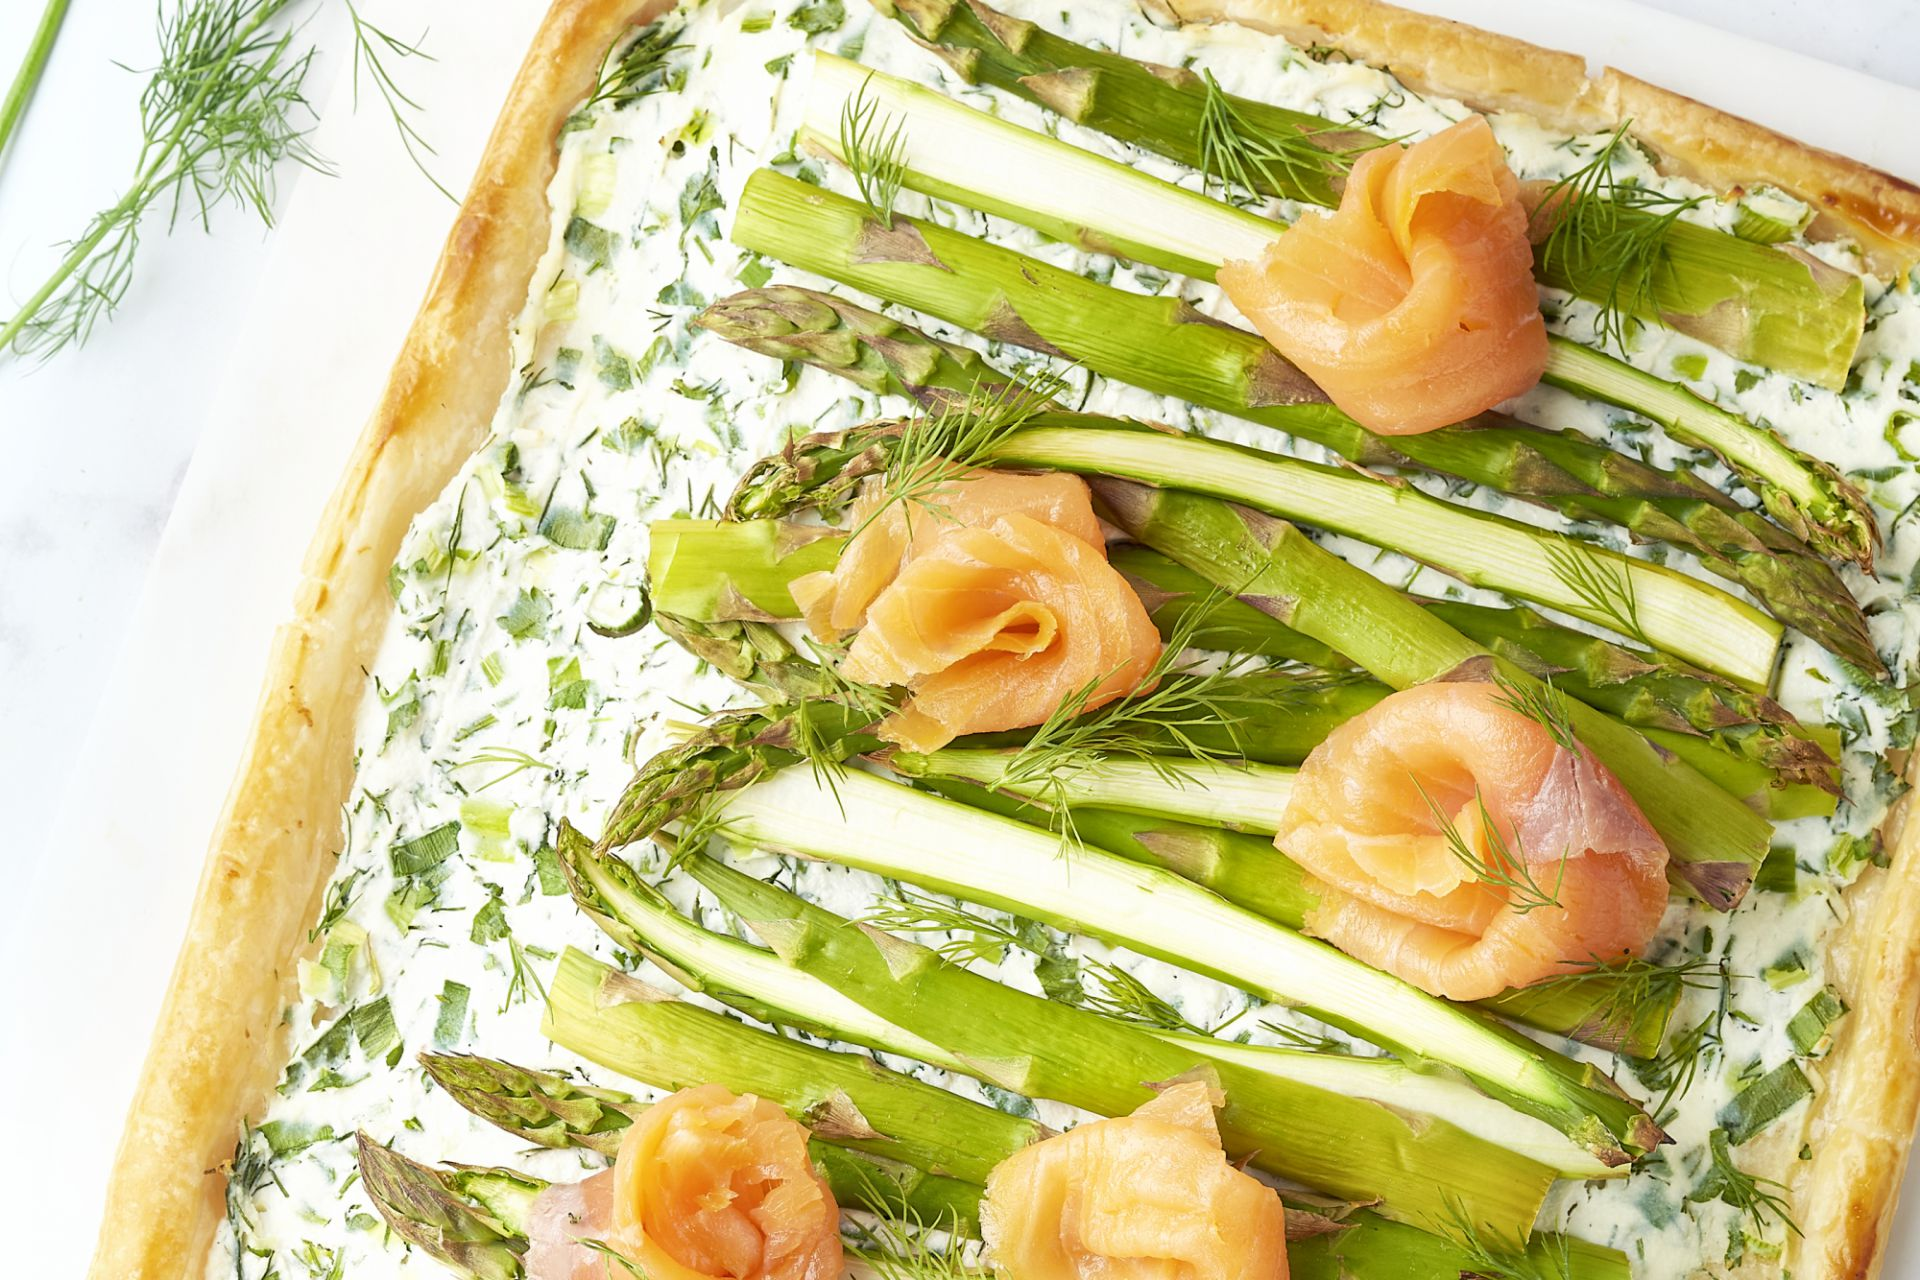 Plaattaart met groene asperges, ricotta en gerookte zalm